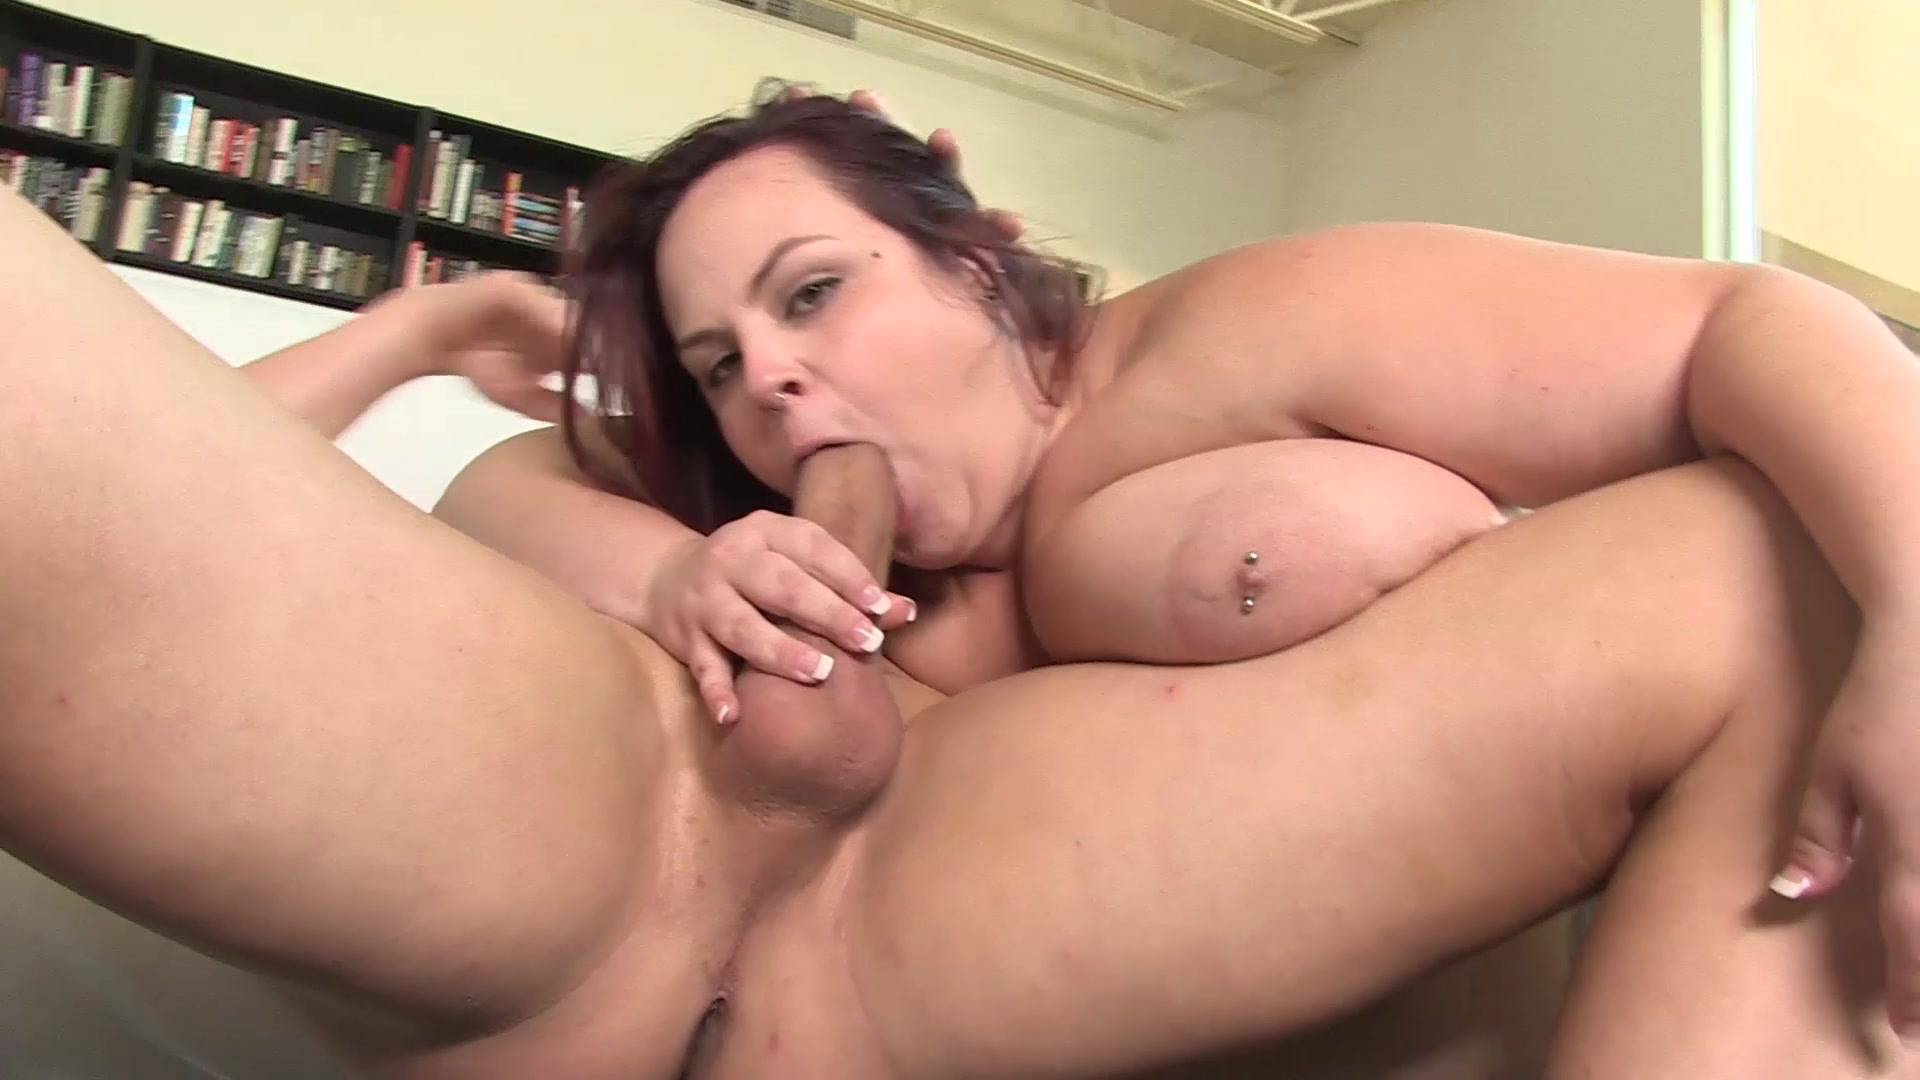 Bbw porn star kiwi